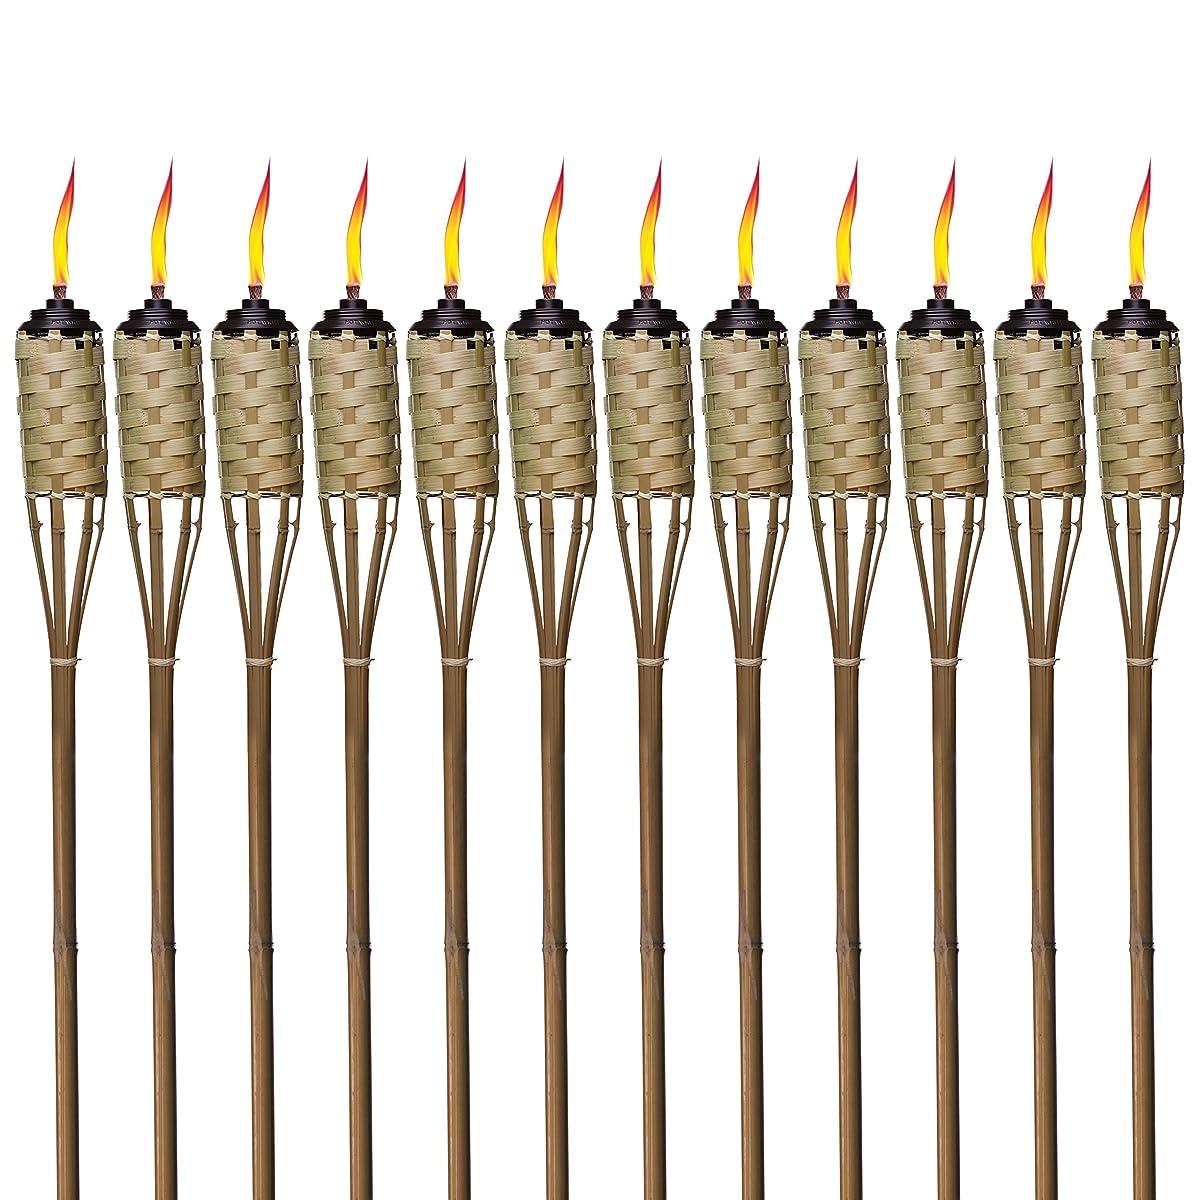 TIKI Brand 57-Inch Luau Bamboo Torches - 12 pack